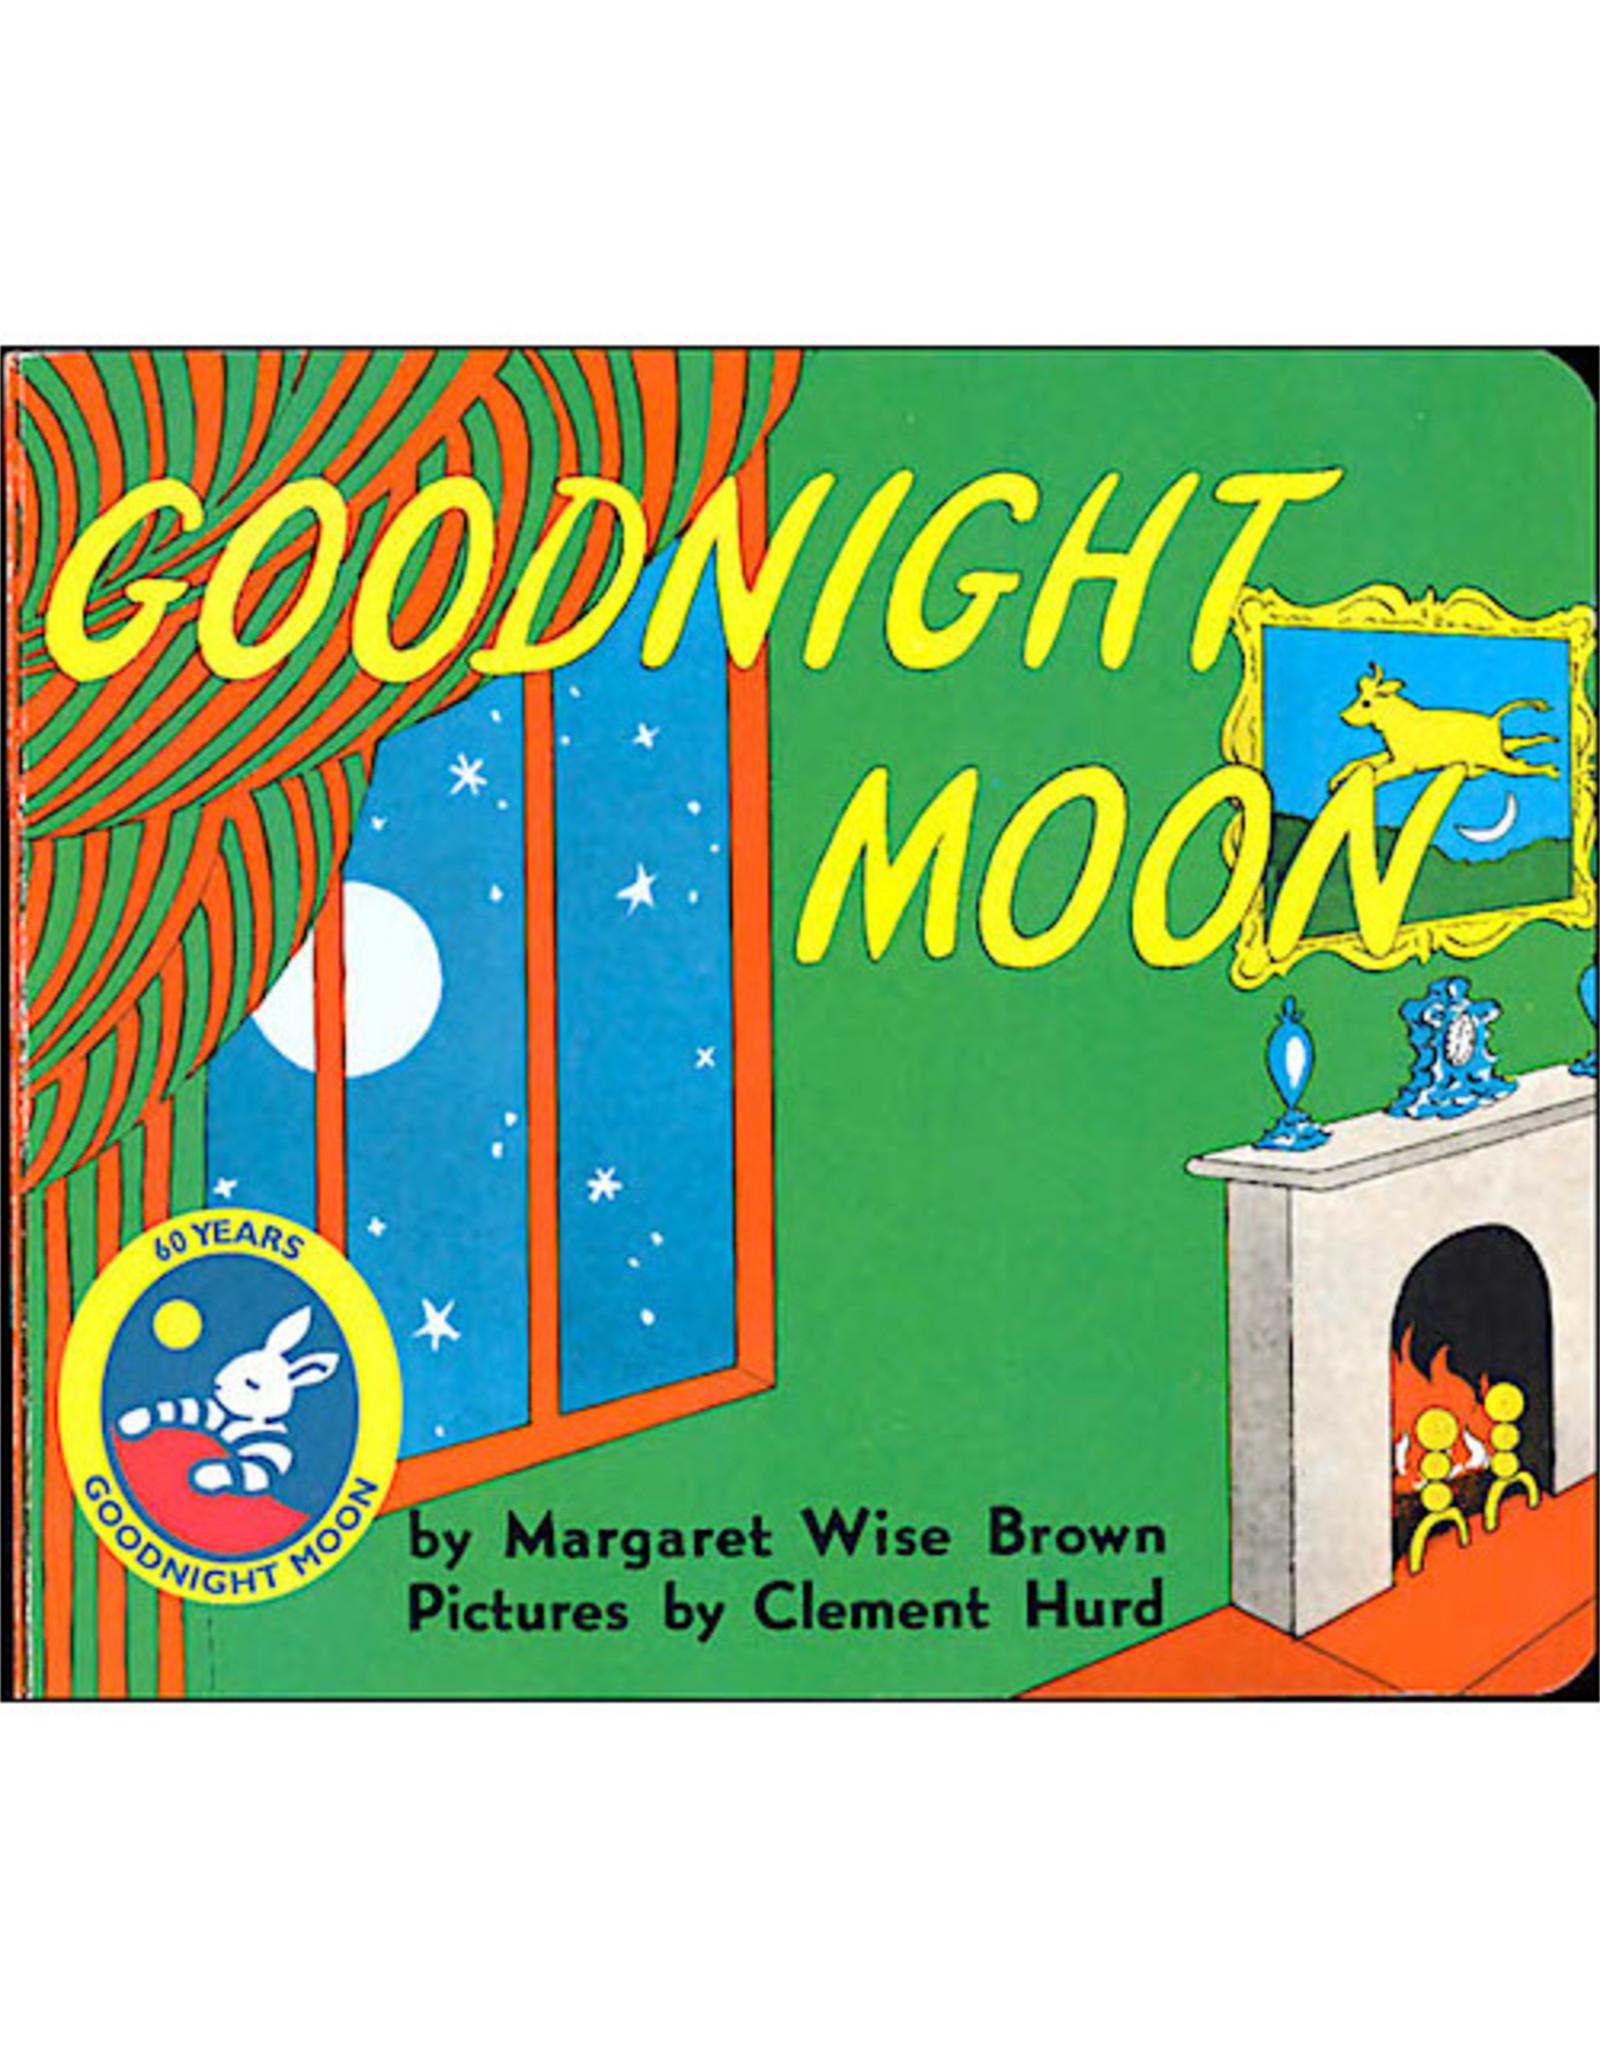 Harper Collins Goodnight Moon Board Book 60th Anniversary Edition - Brown, Margaret Wise